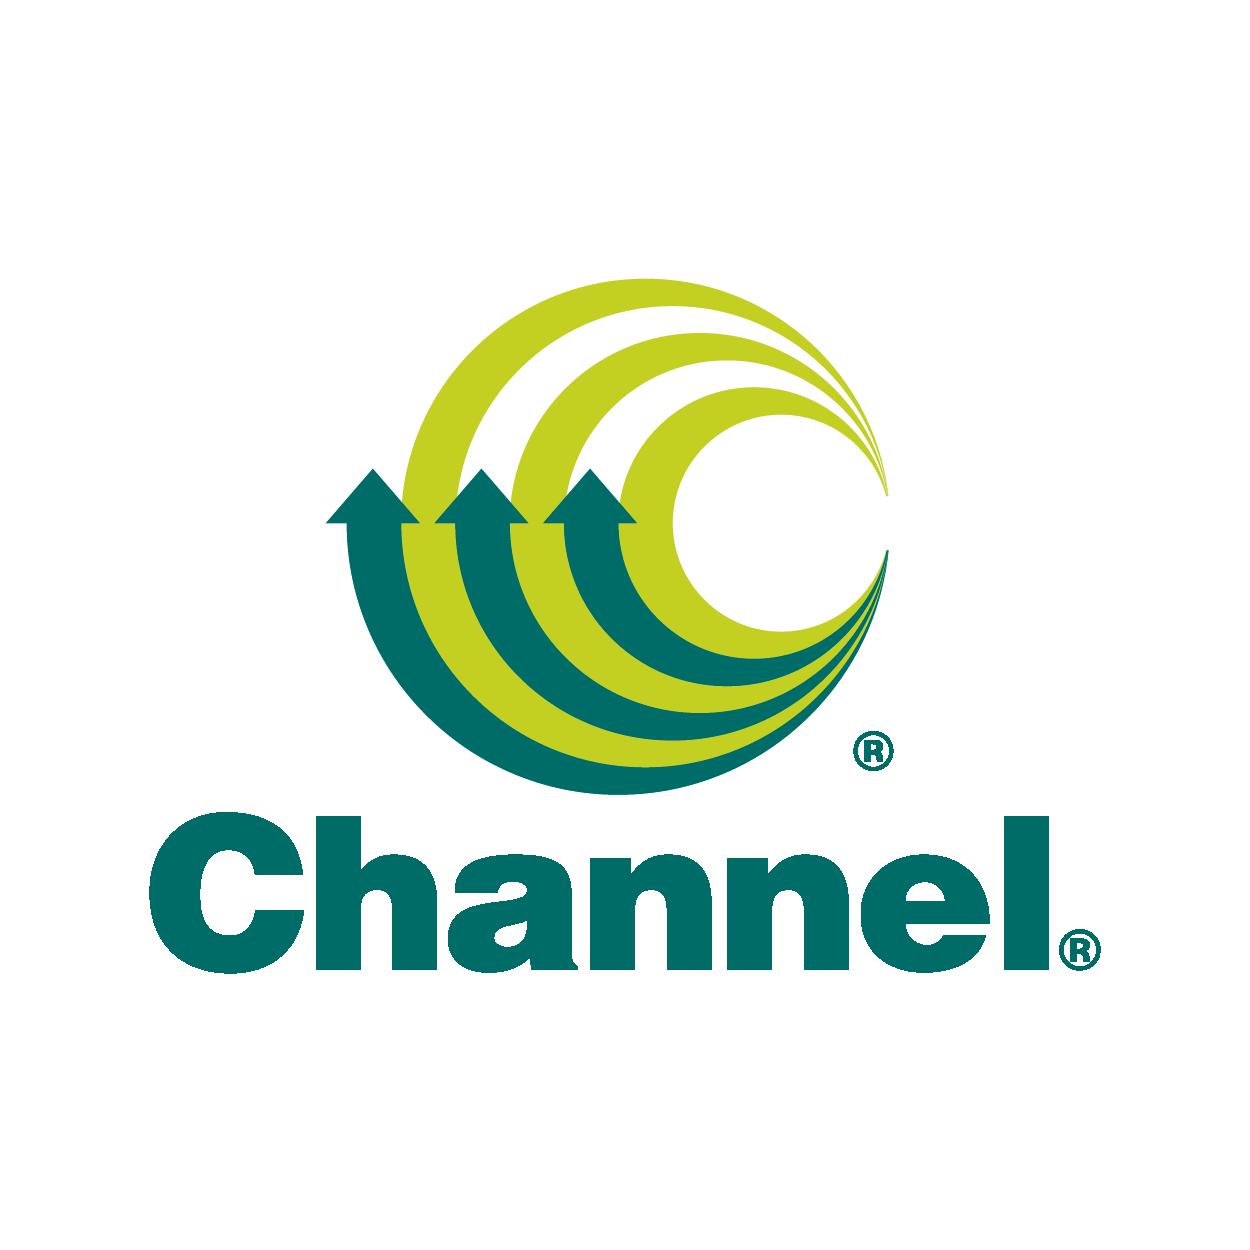 Channel Stickers messages sticker-6